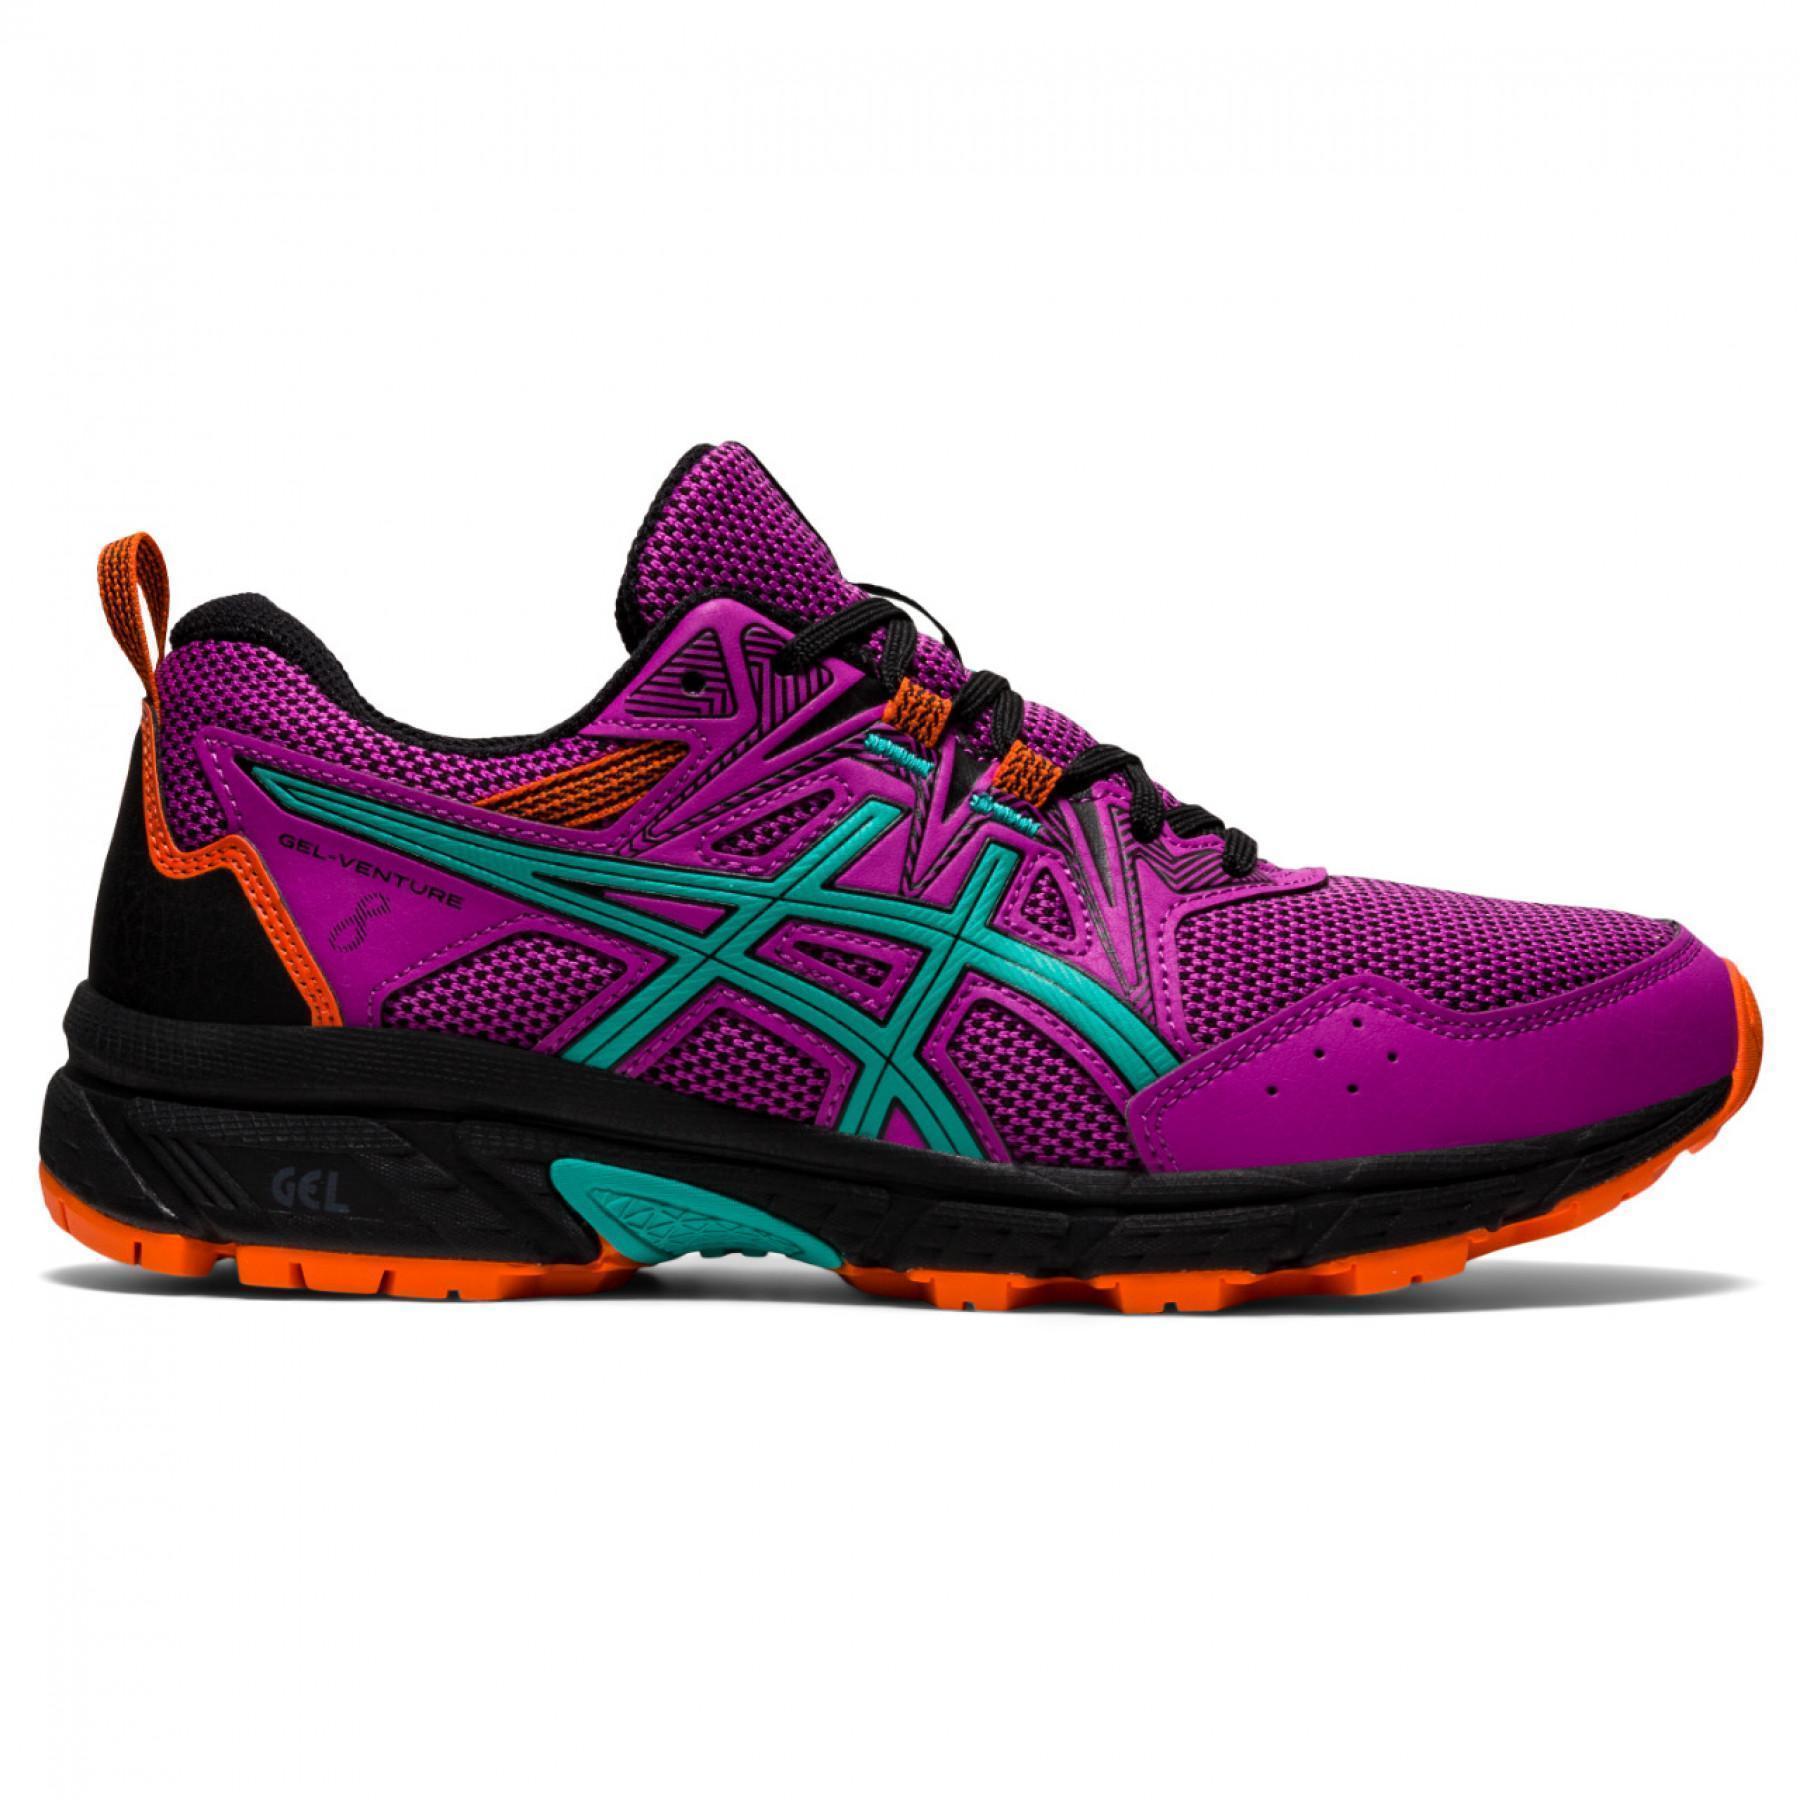 Asics Gel-Venture 8 Women's Shoes